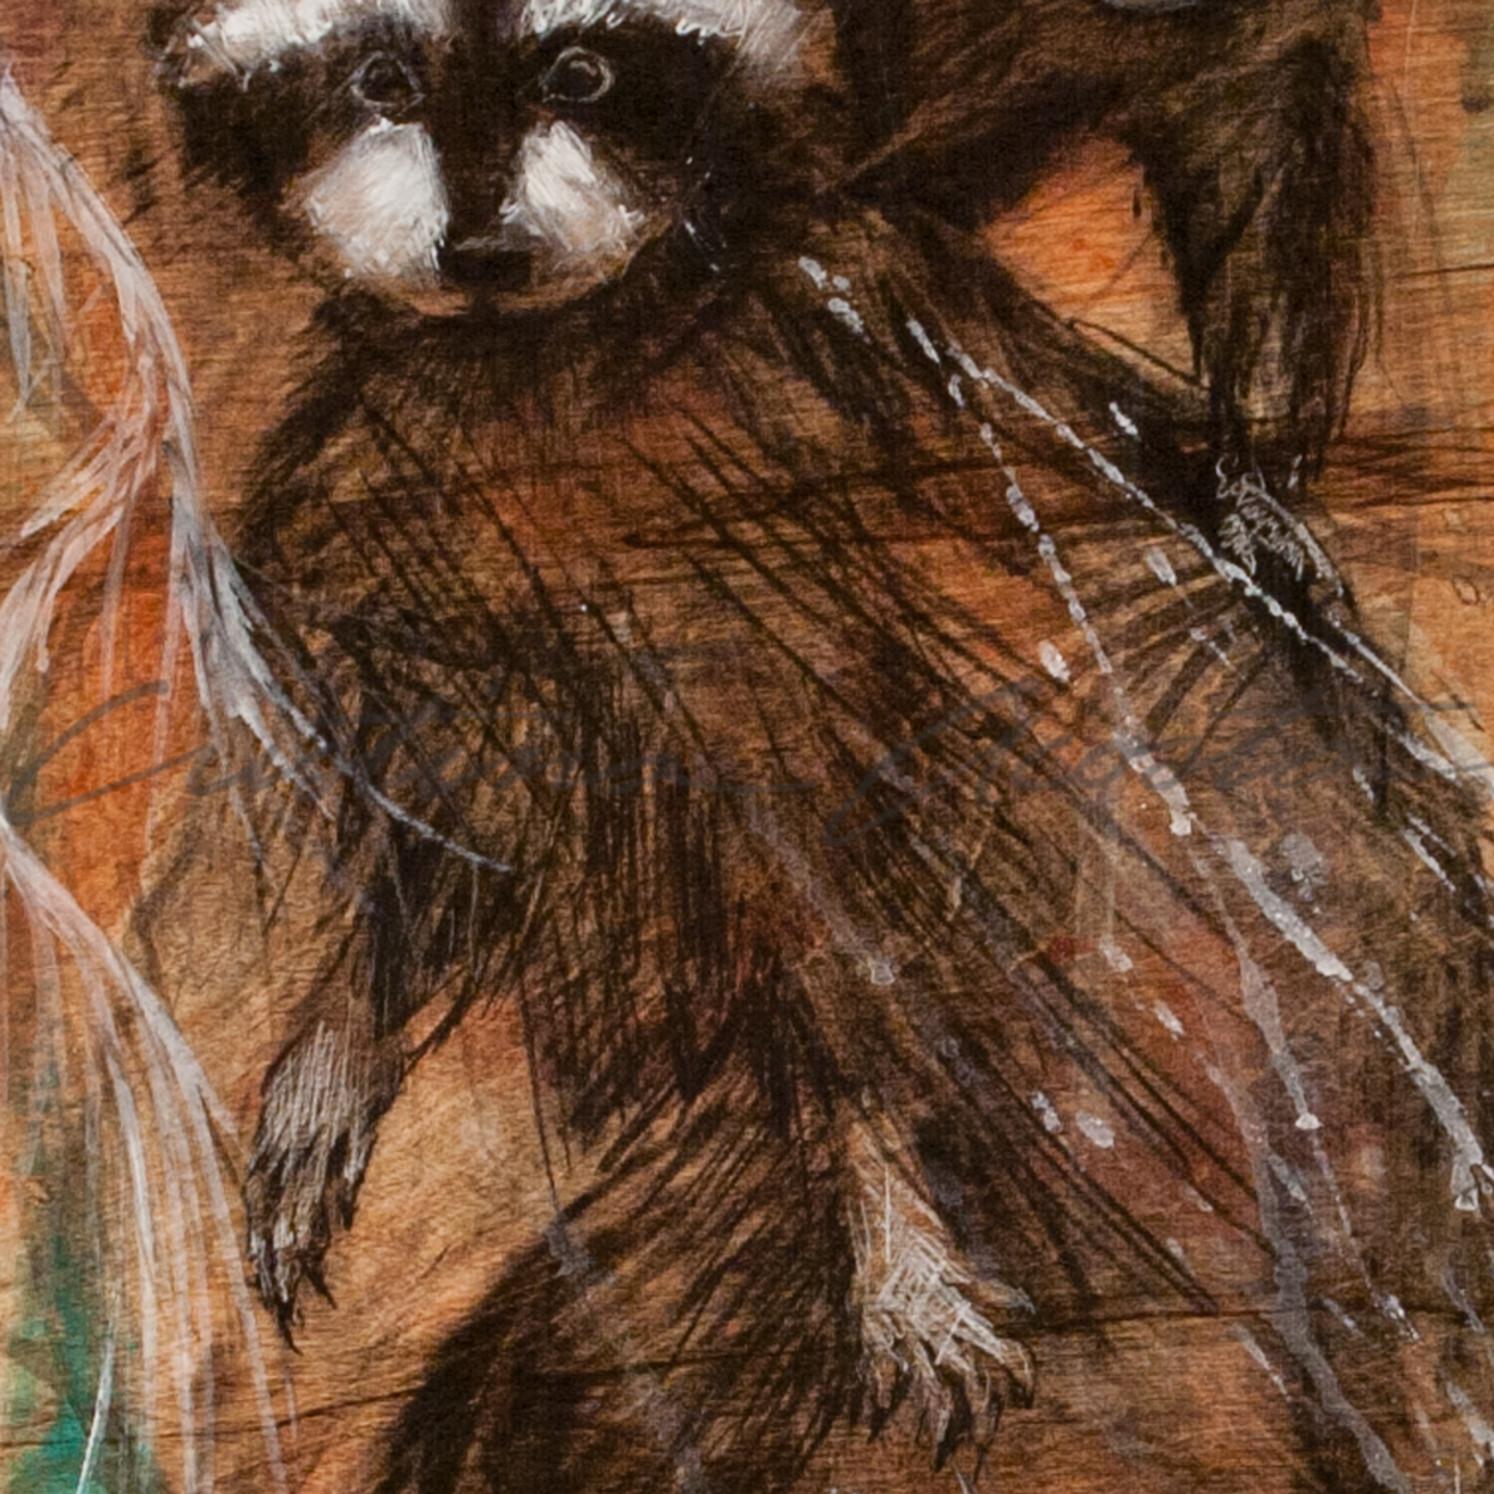 Raccoons dionwv